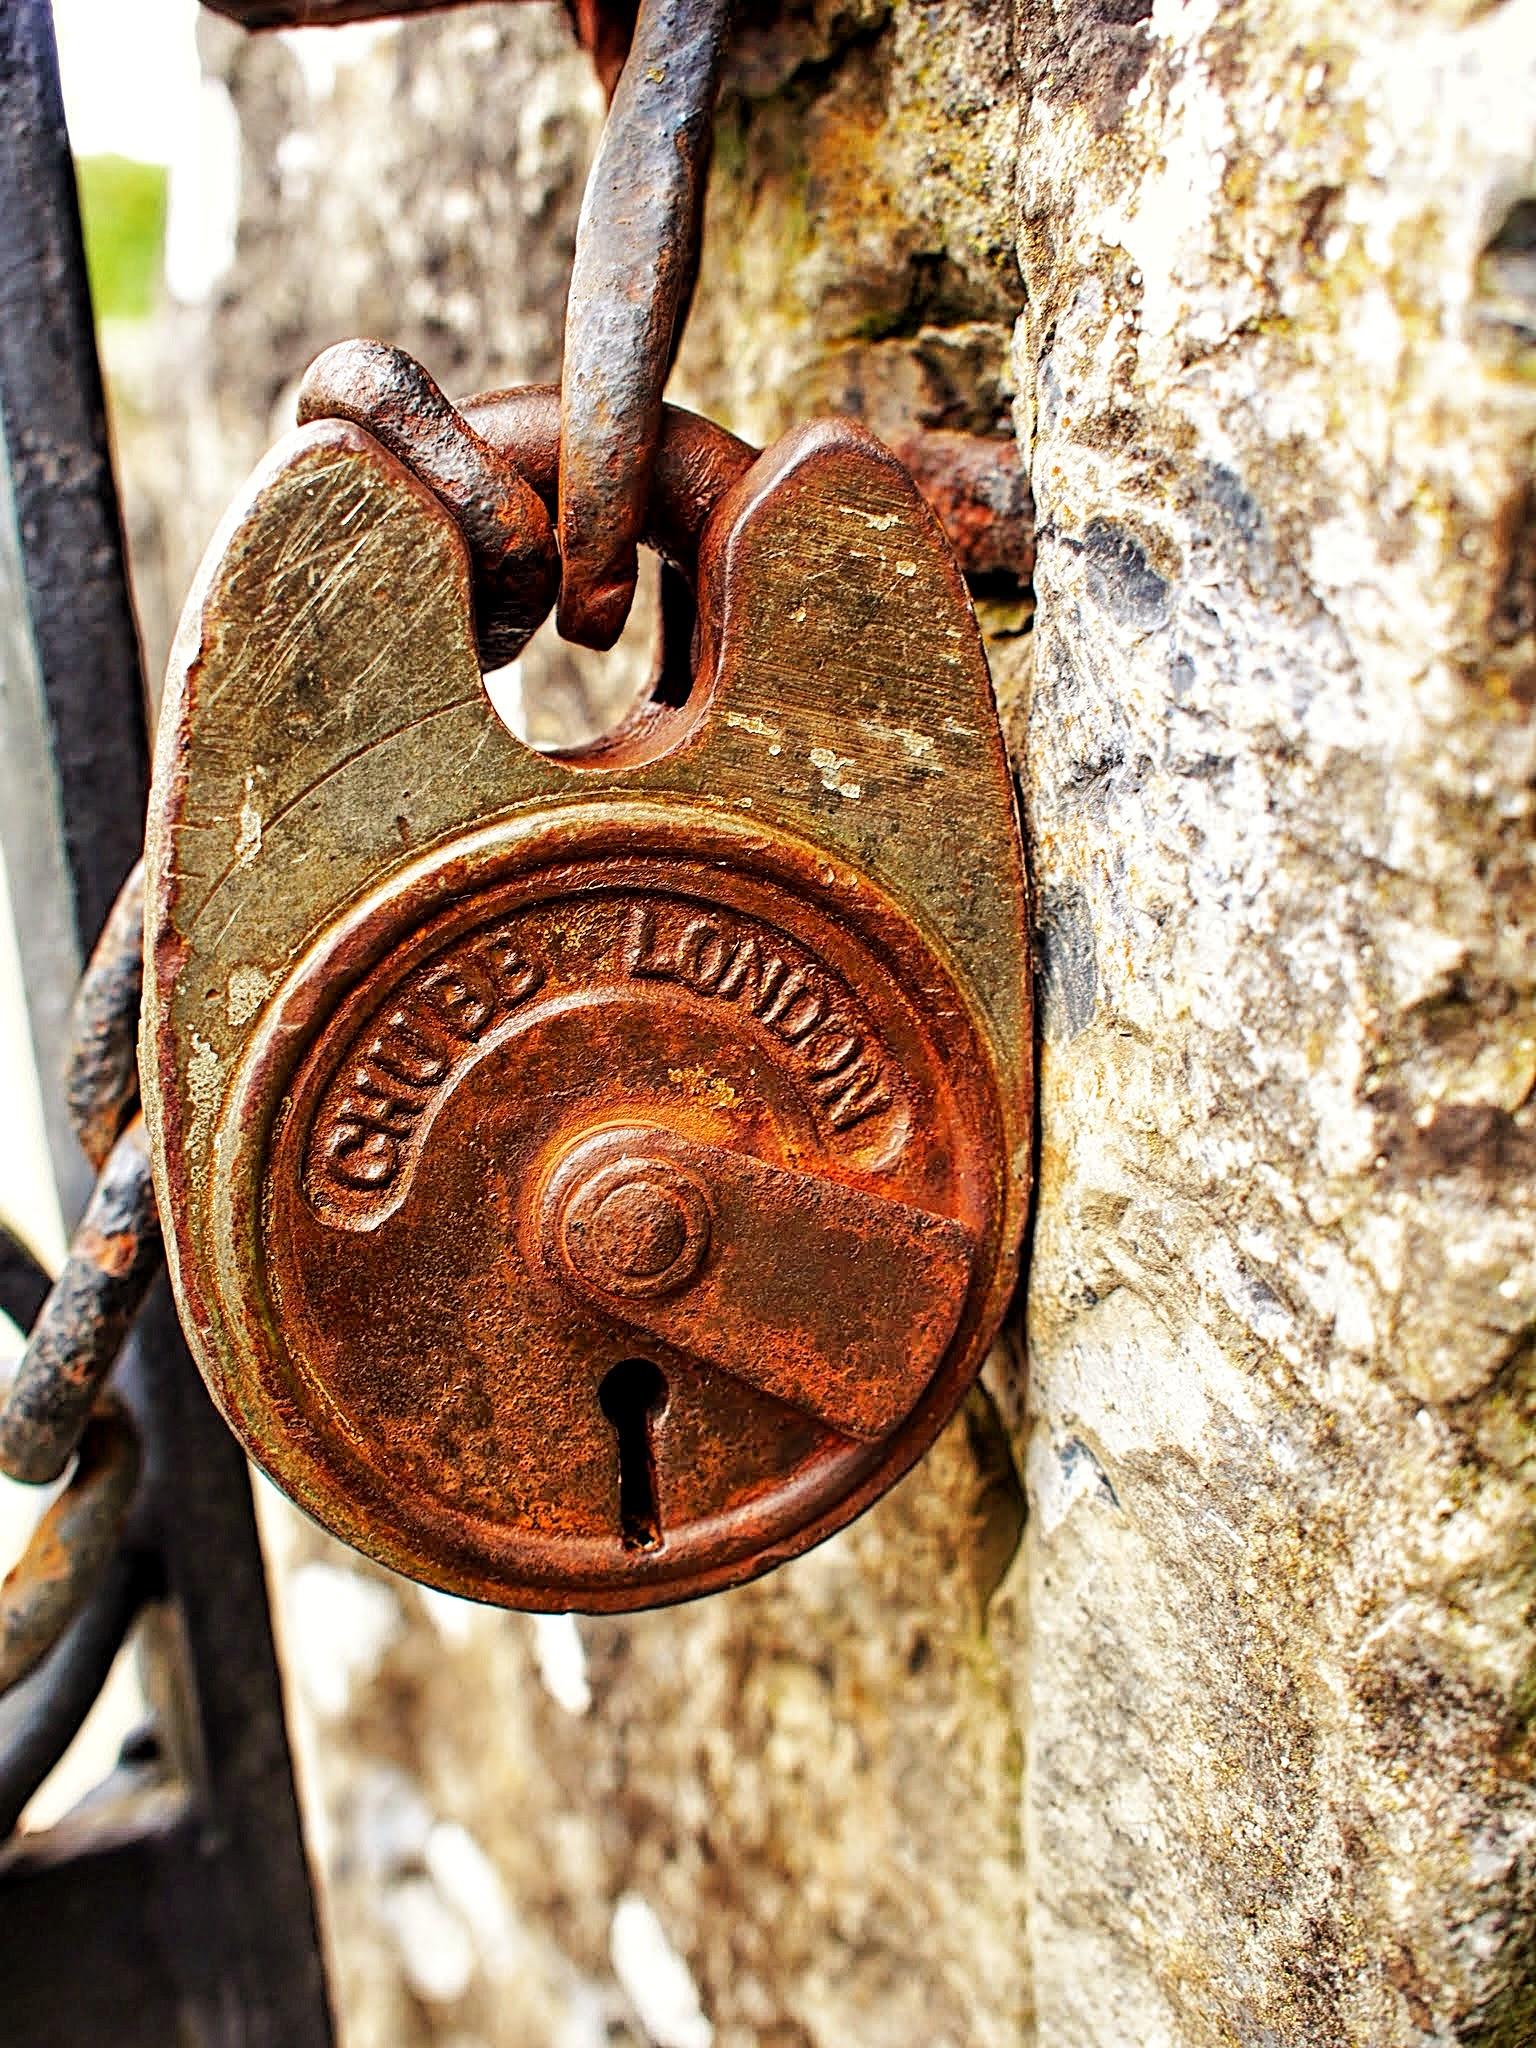 Stacie's new addiction - old locks